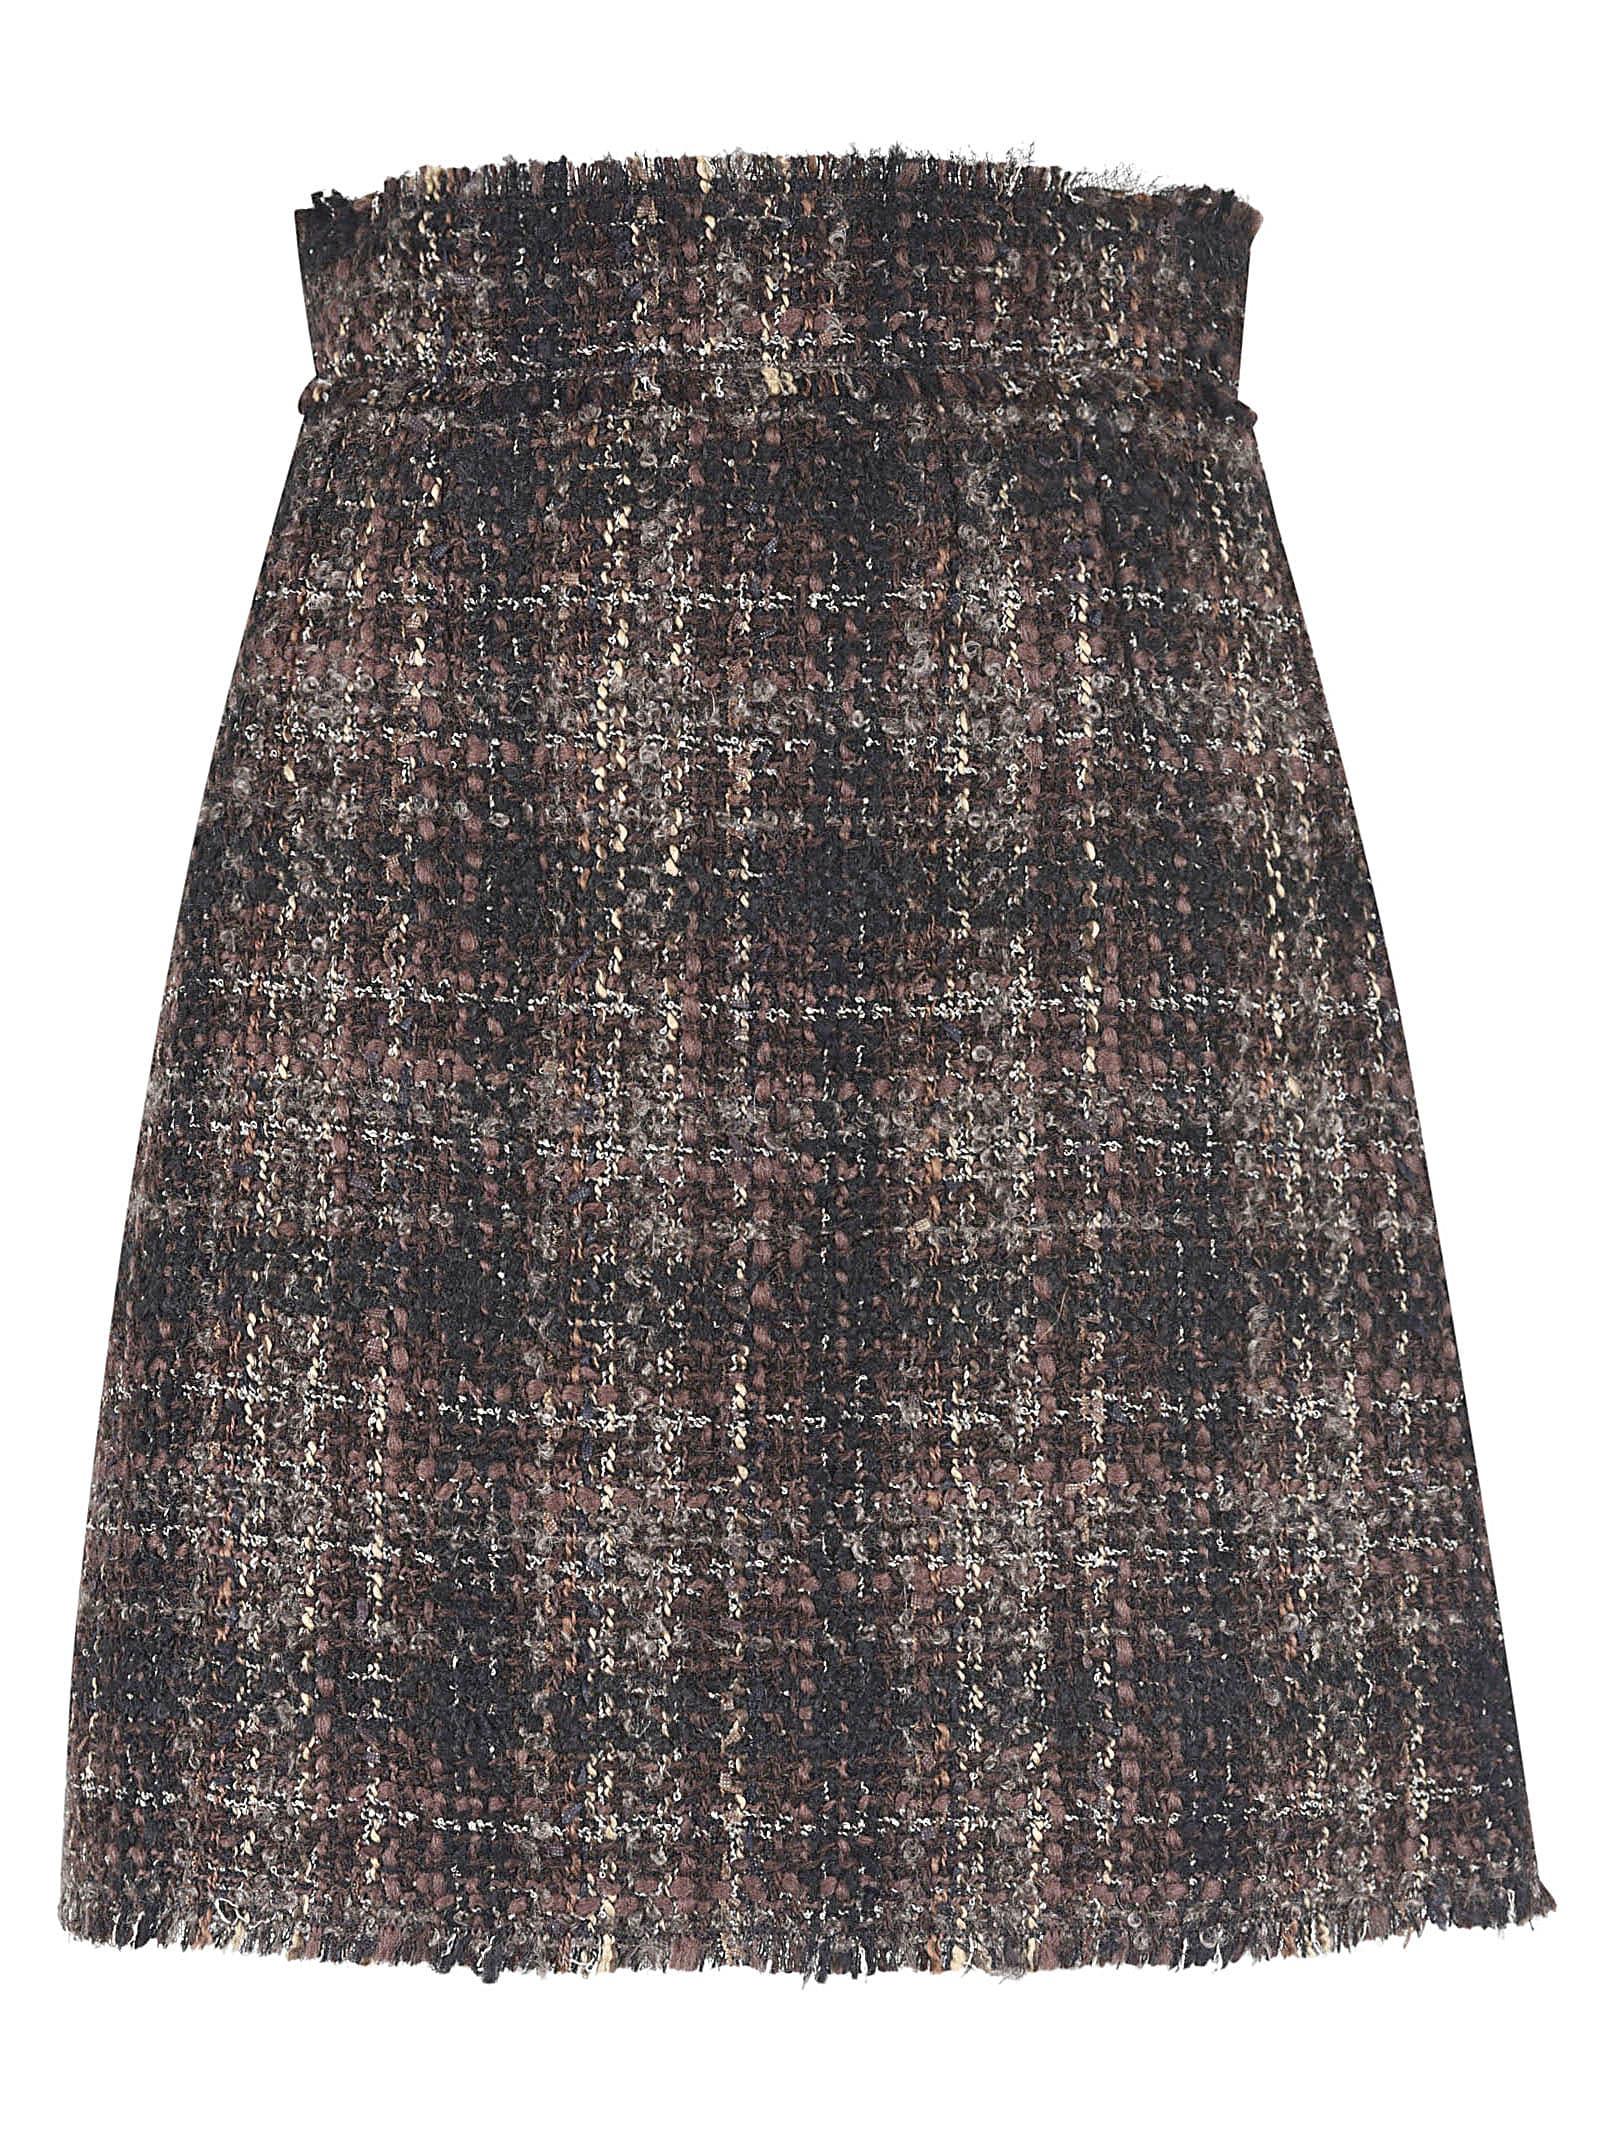 Dolce & Gabbana Checked Woven Skirt